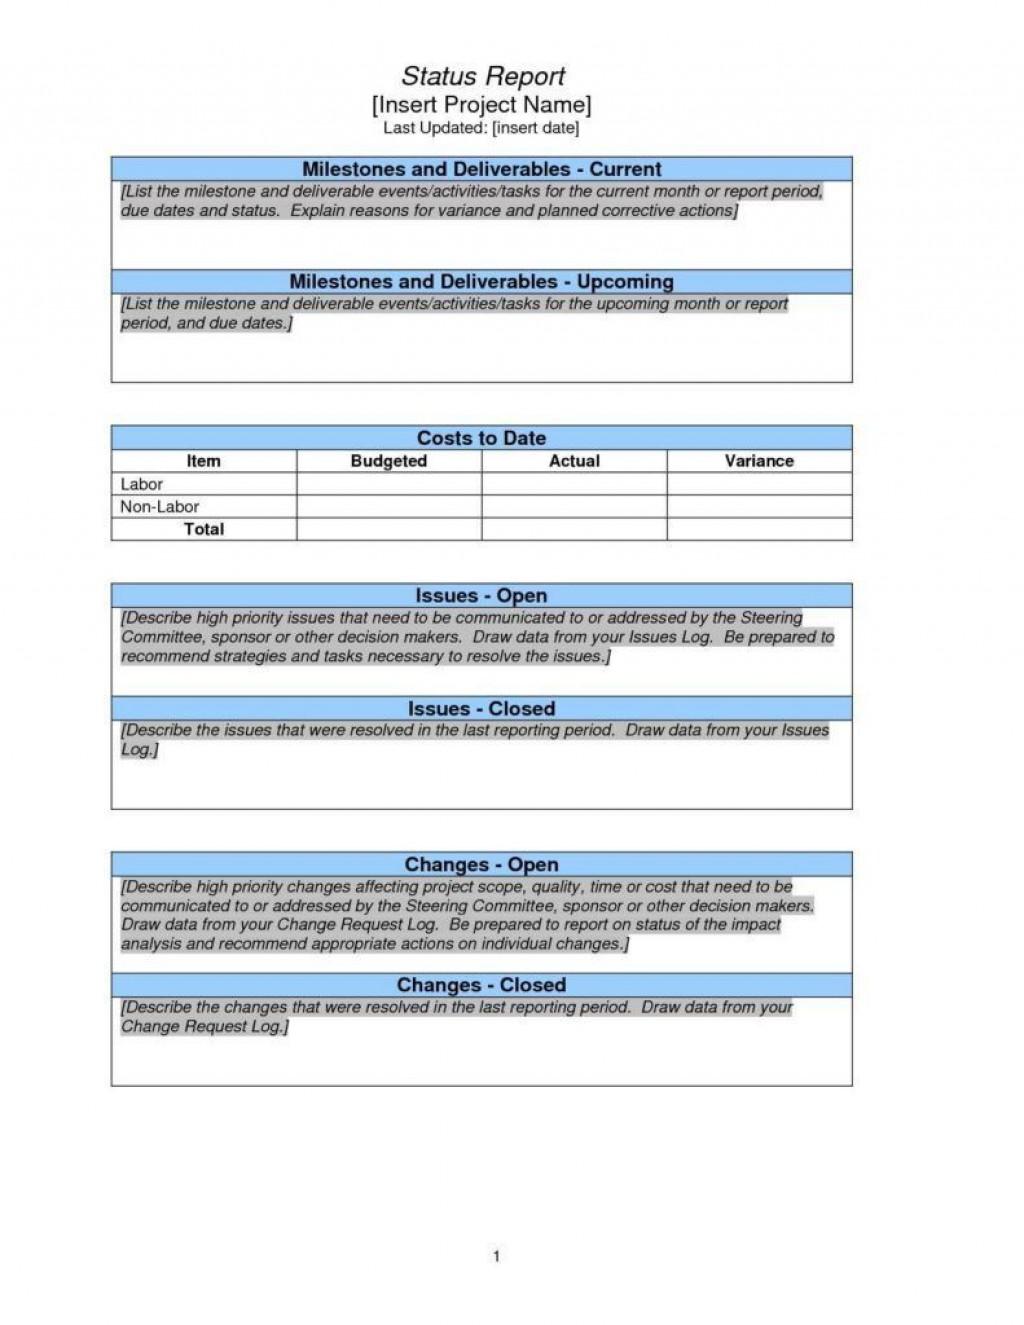 001 Amazing Project Management Report Template Excel Inspiration  Weekly Statu ProgresLarge